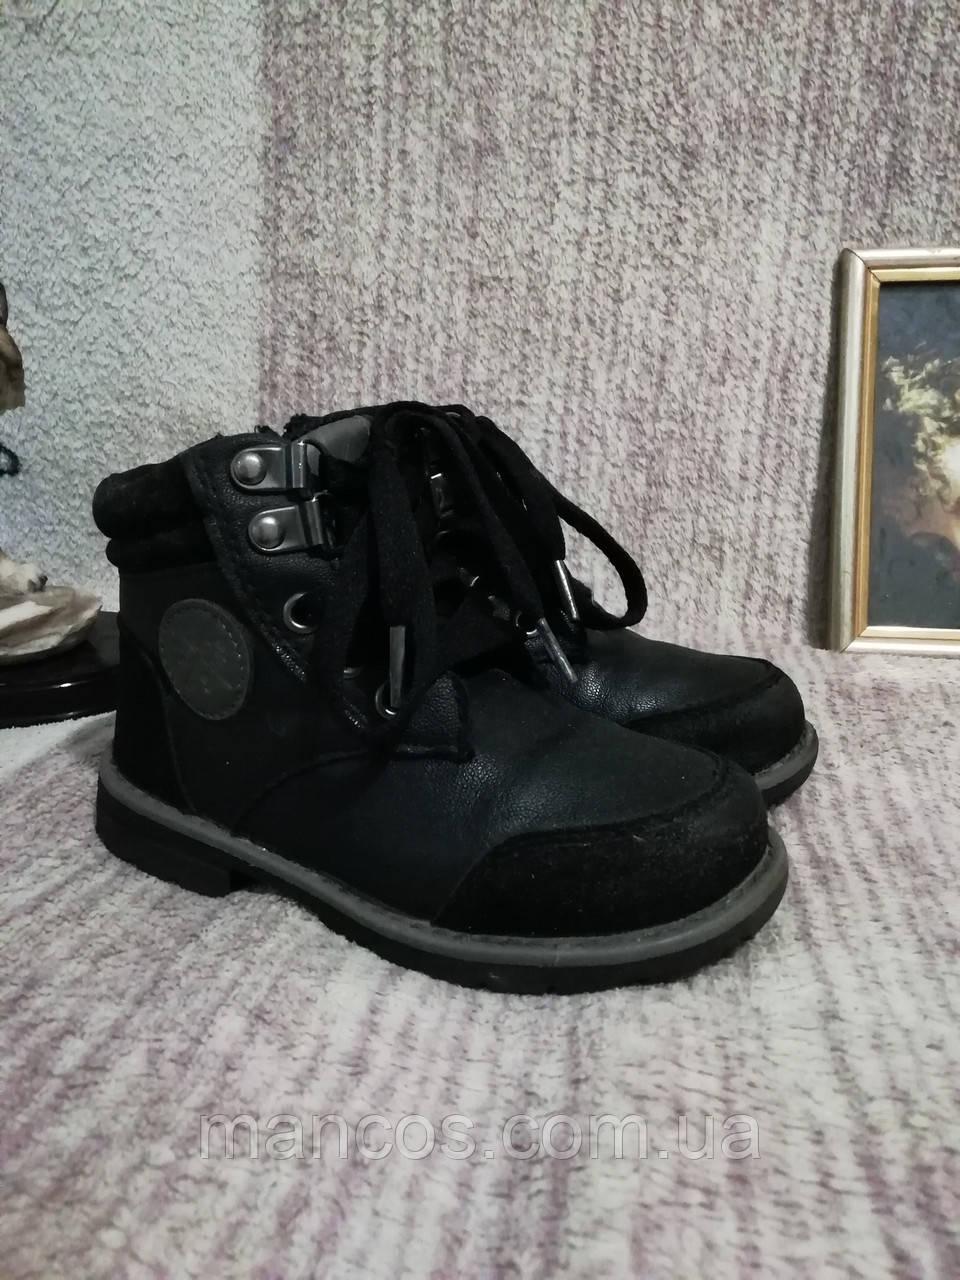 7a993b2b7d29f0 Lupilu: Дитяче взуття Оголошення в Україні на BESPLATKA.ua